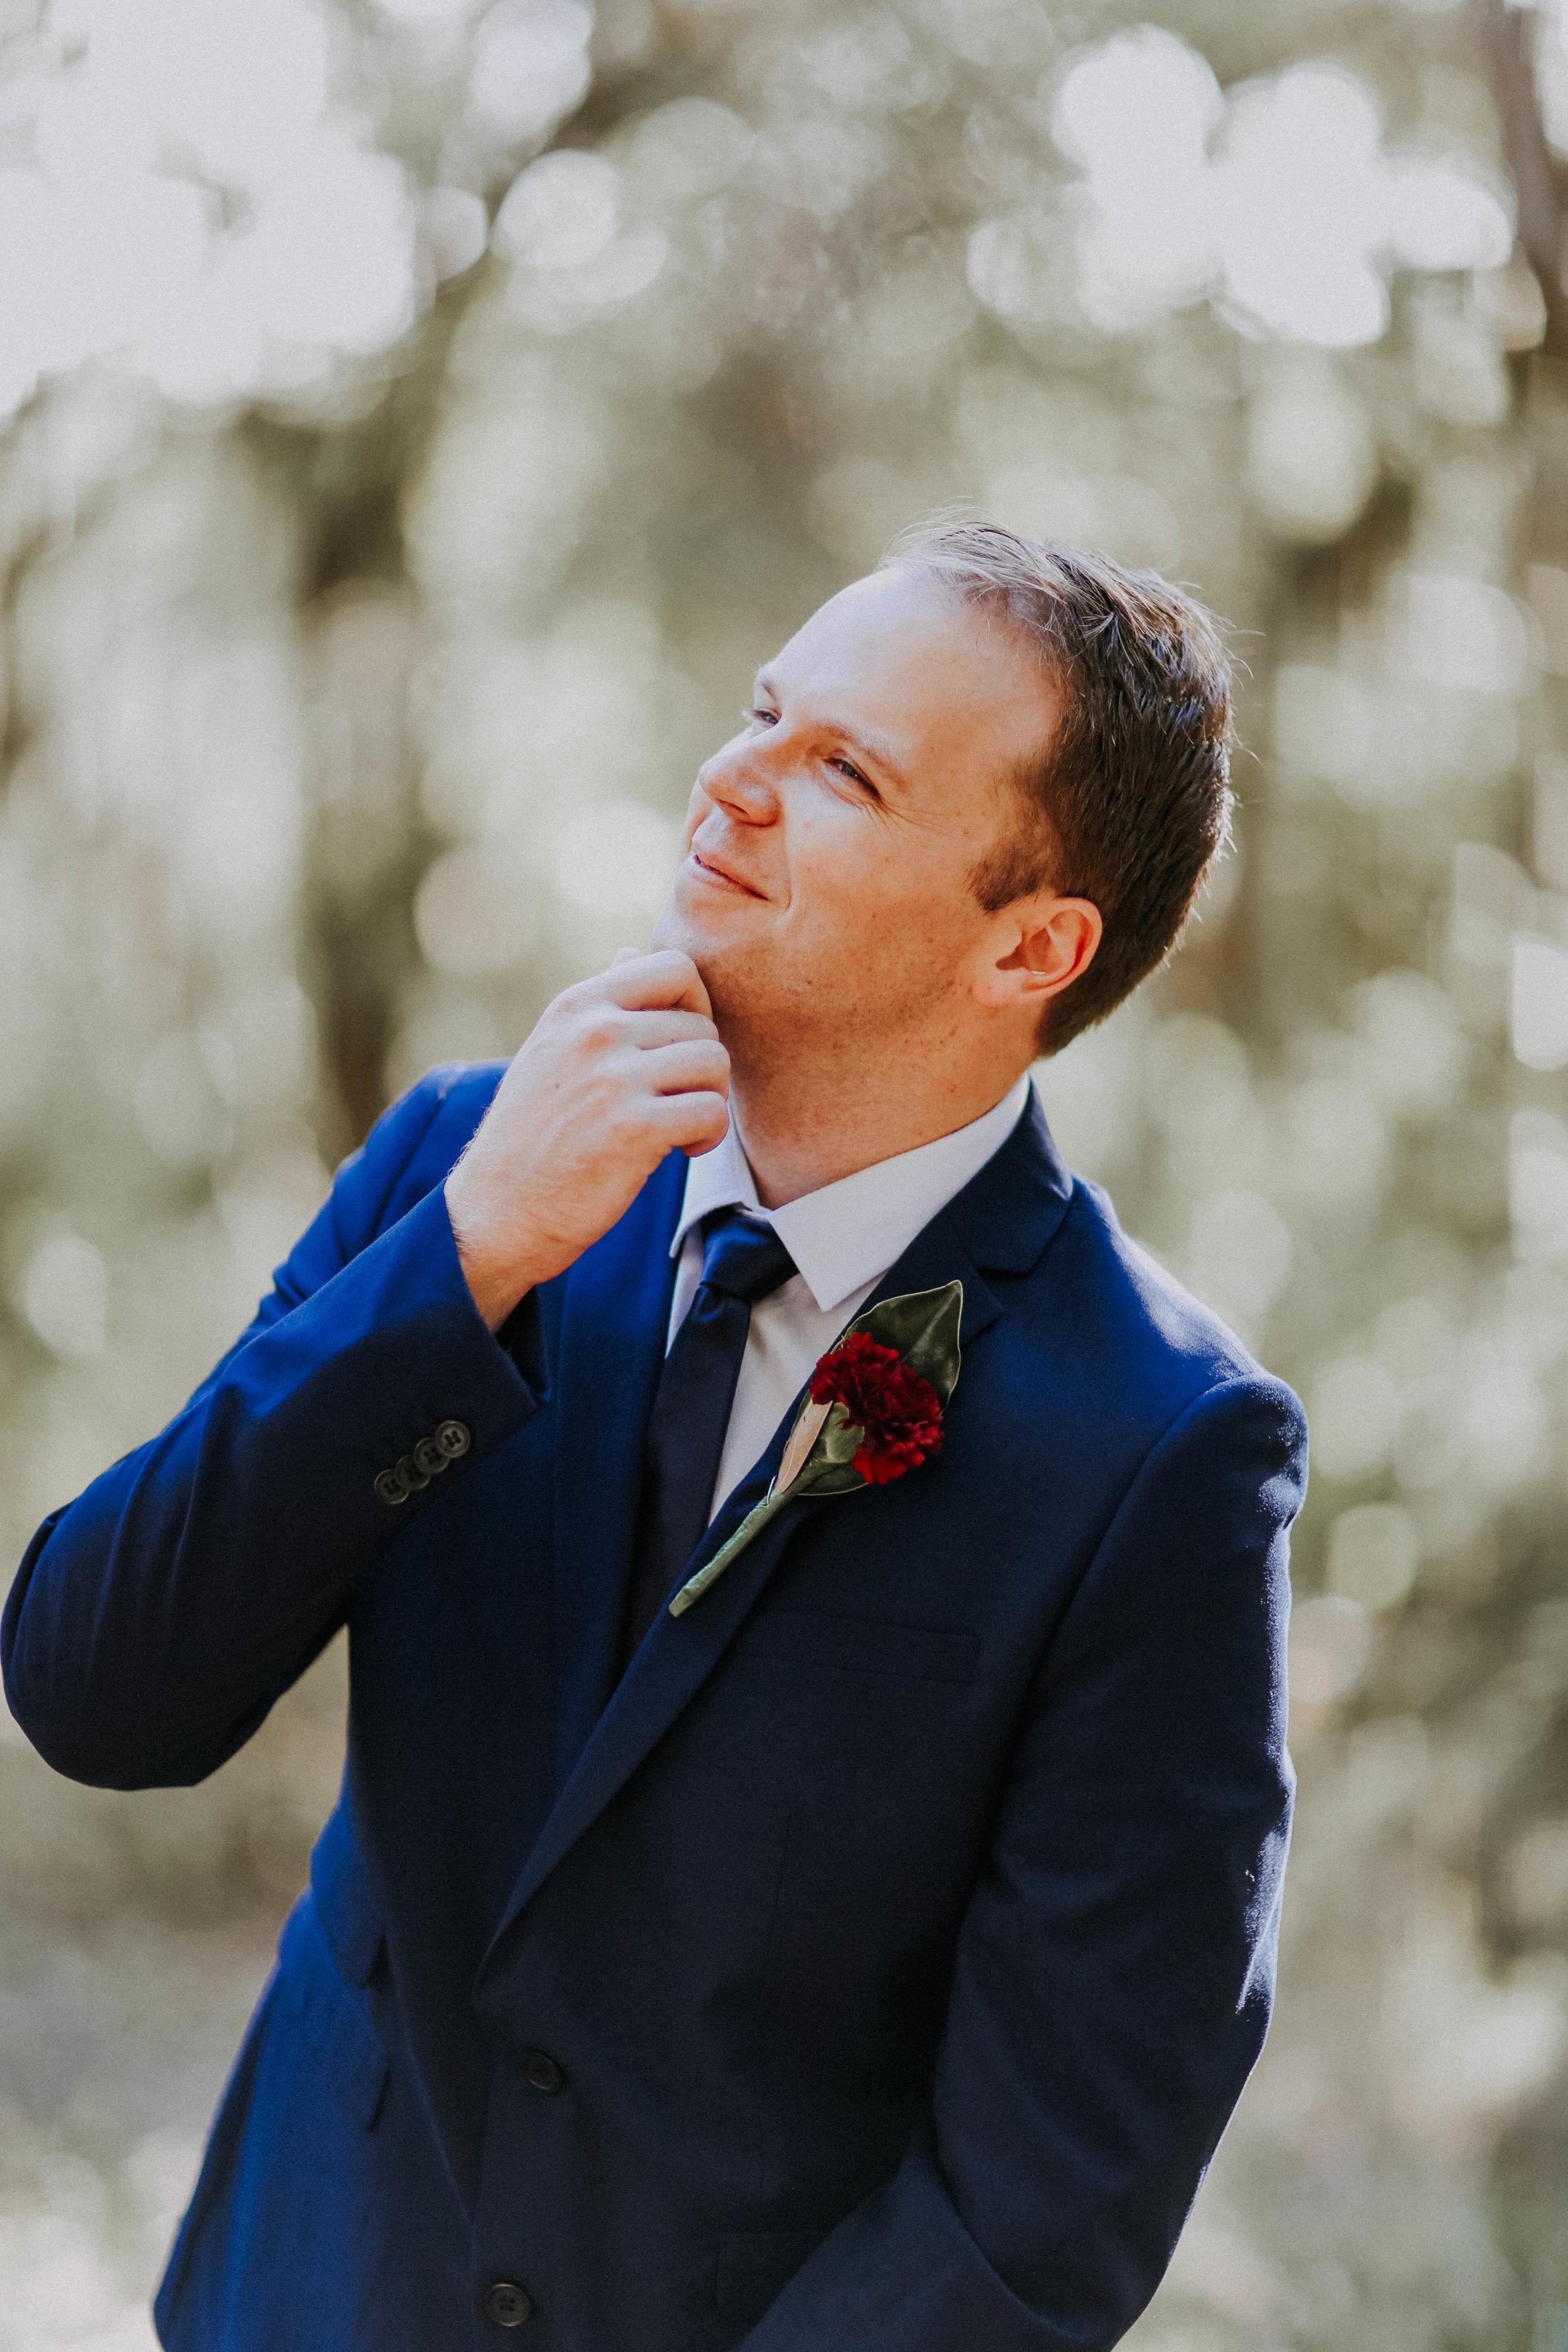 Jess + Aaron Knight - Wedding Photos Finals-329.jpg